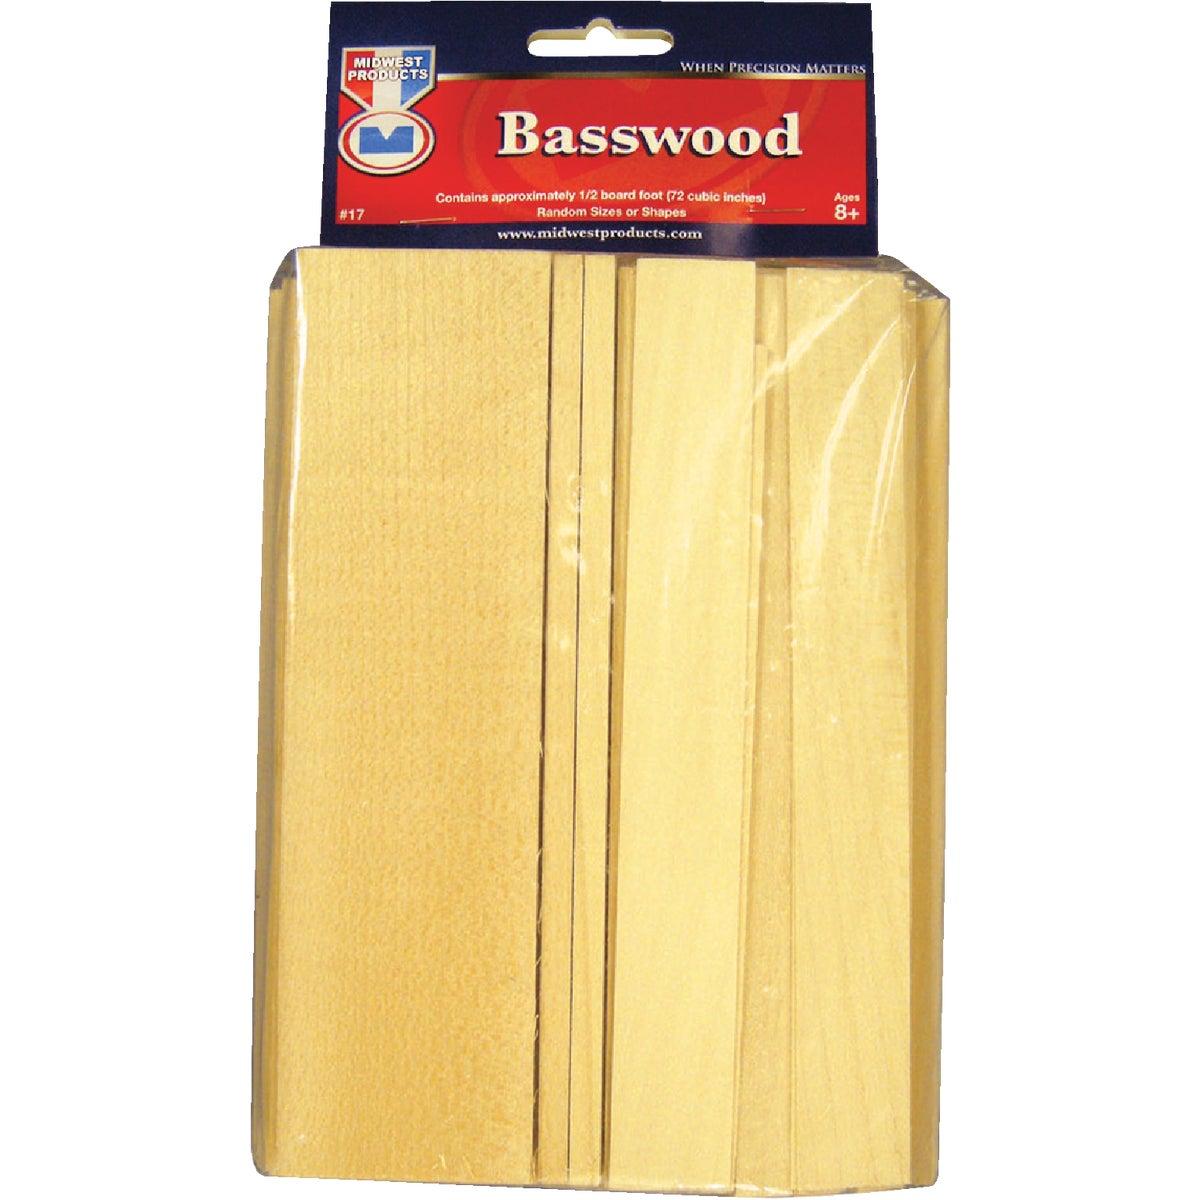 ECONO BASSWOOD BOARD